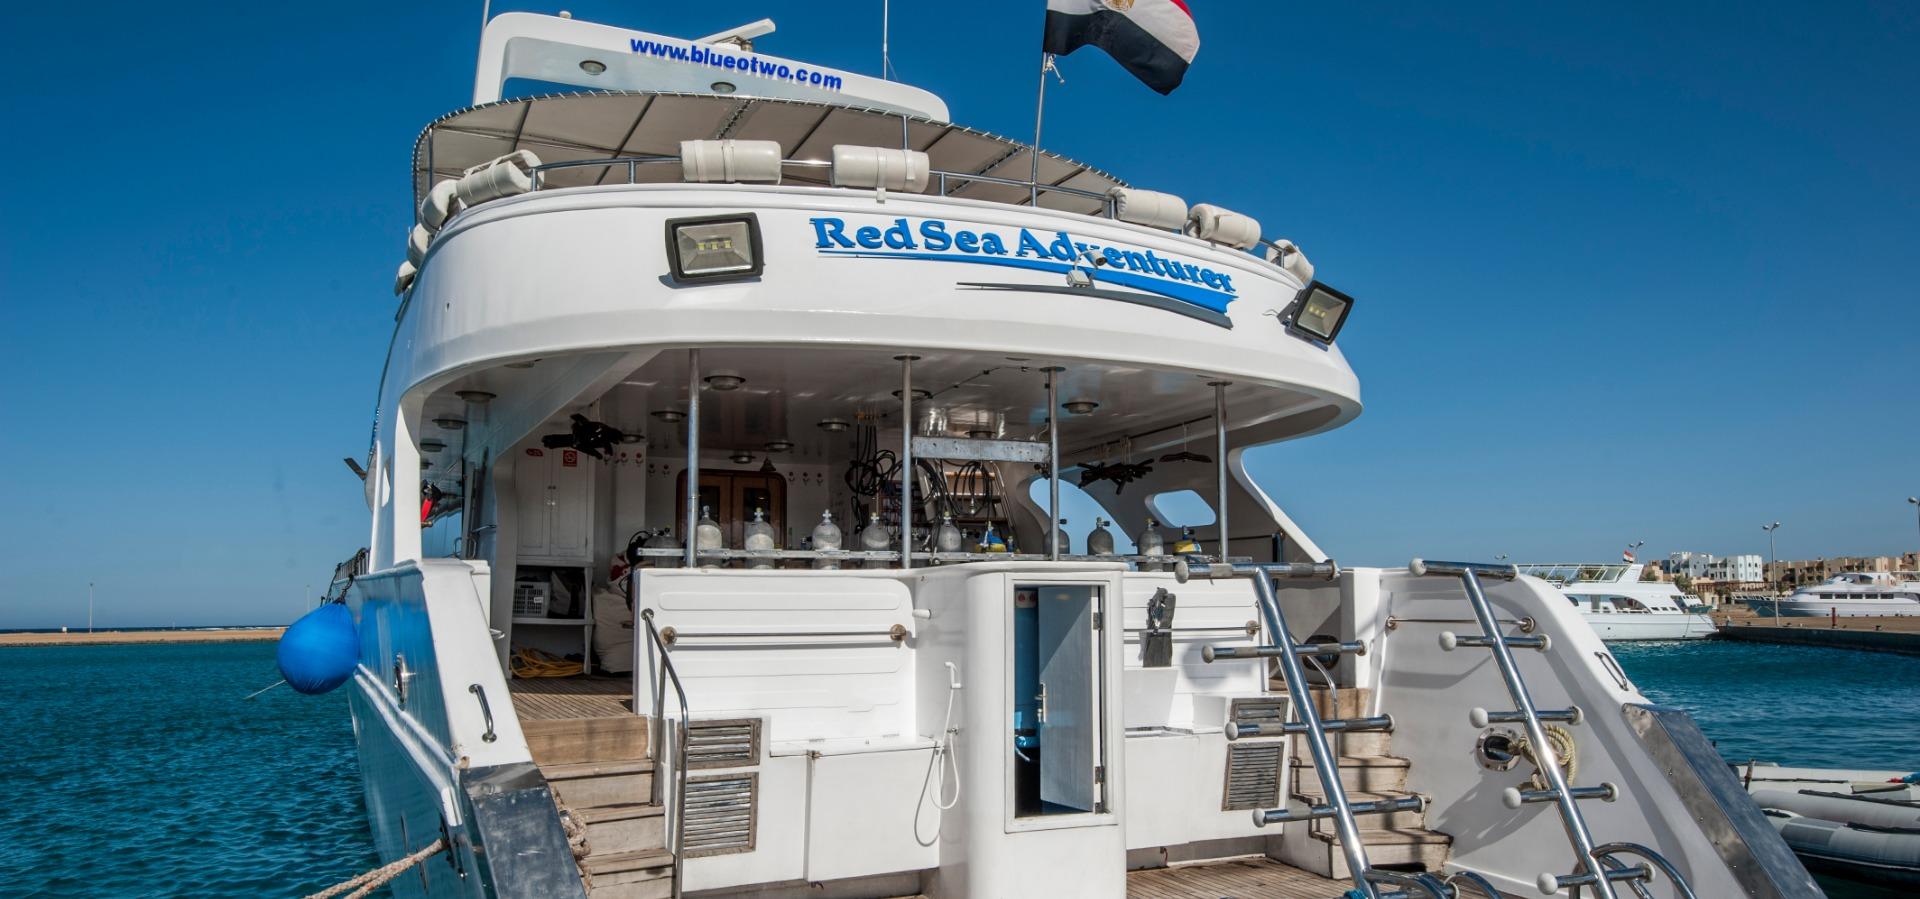 Stern of M/Y Red Sea Adventurer liveaboard diving vessel docked in Red Sea harbour